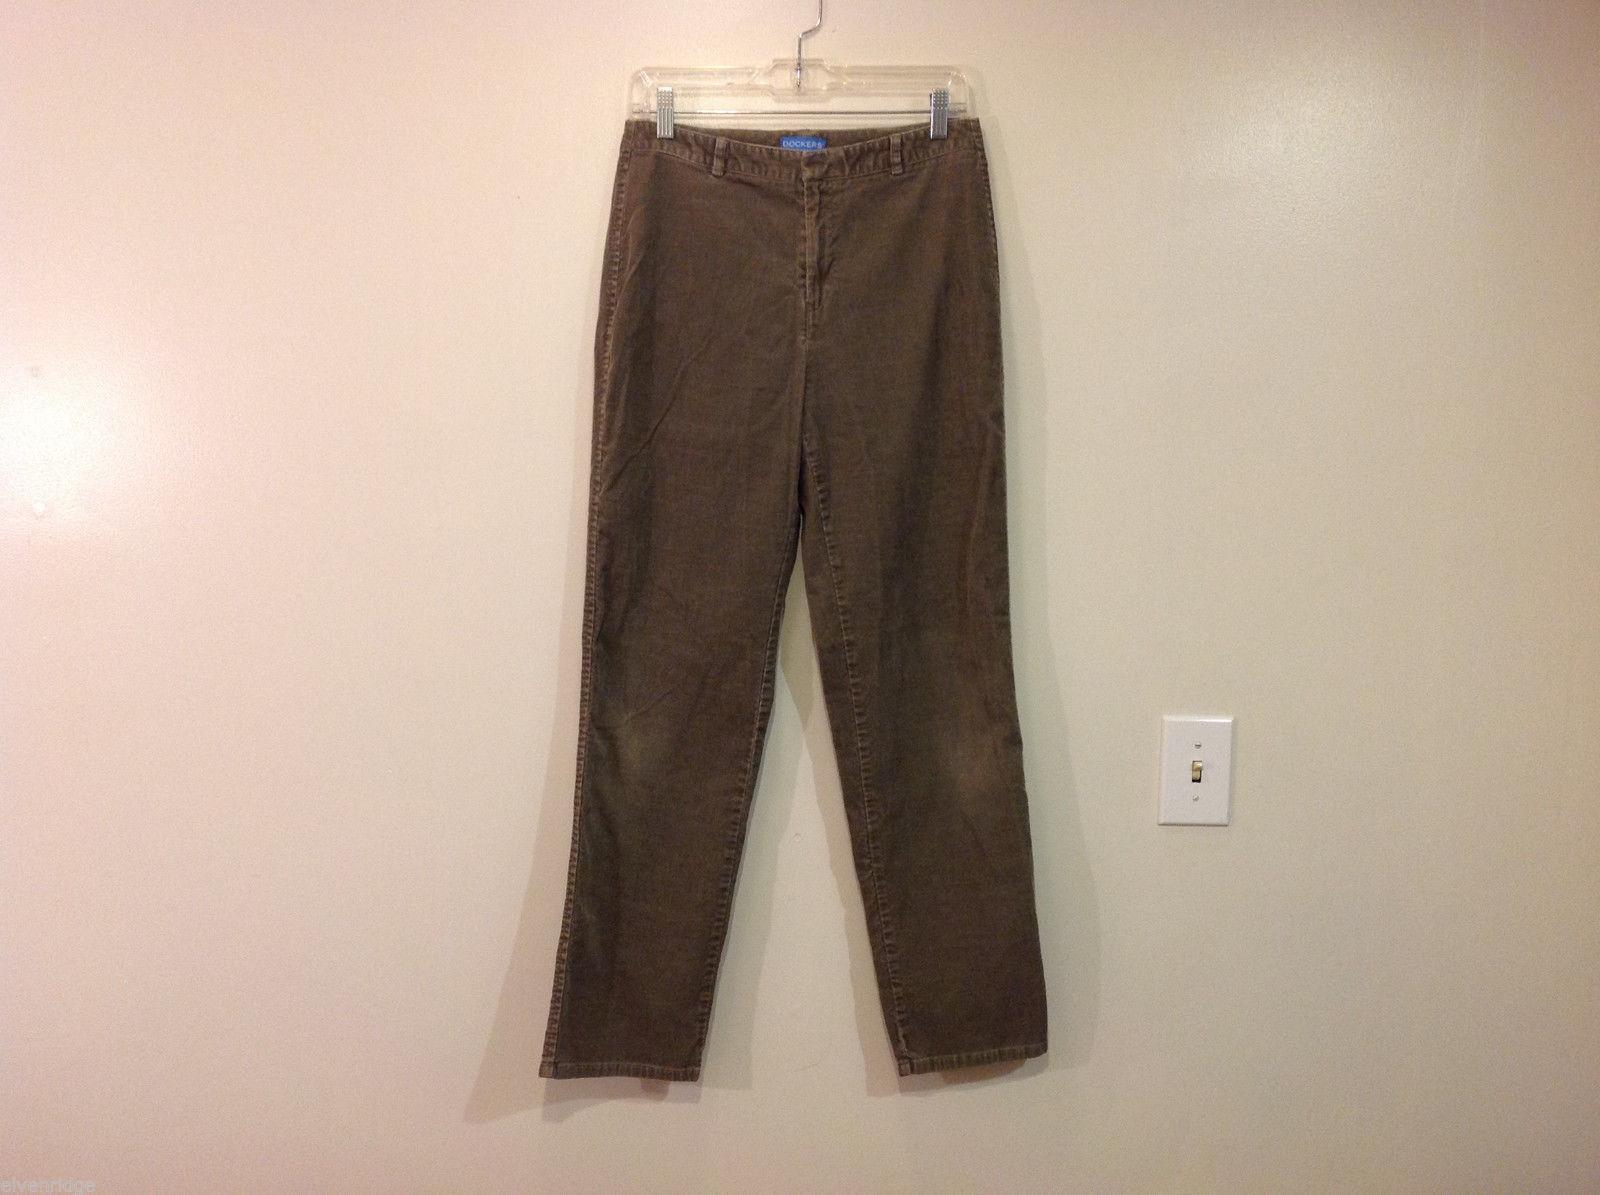 Dockers Women Olive Green Velvet Casual Pants, Size 8